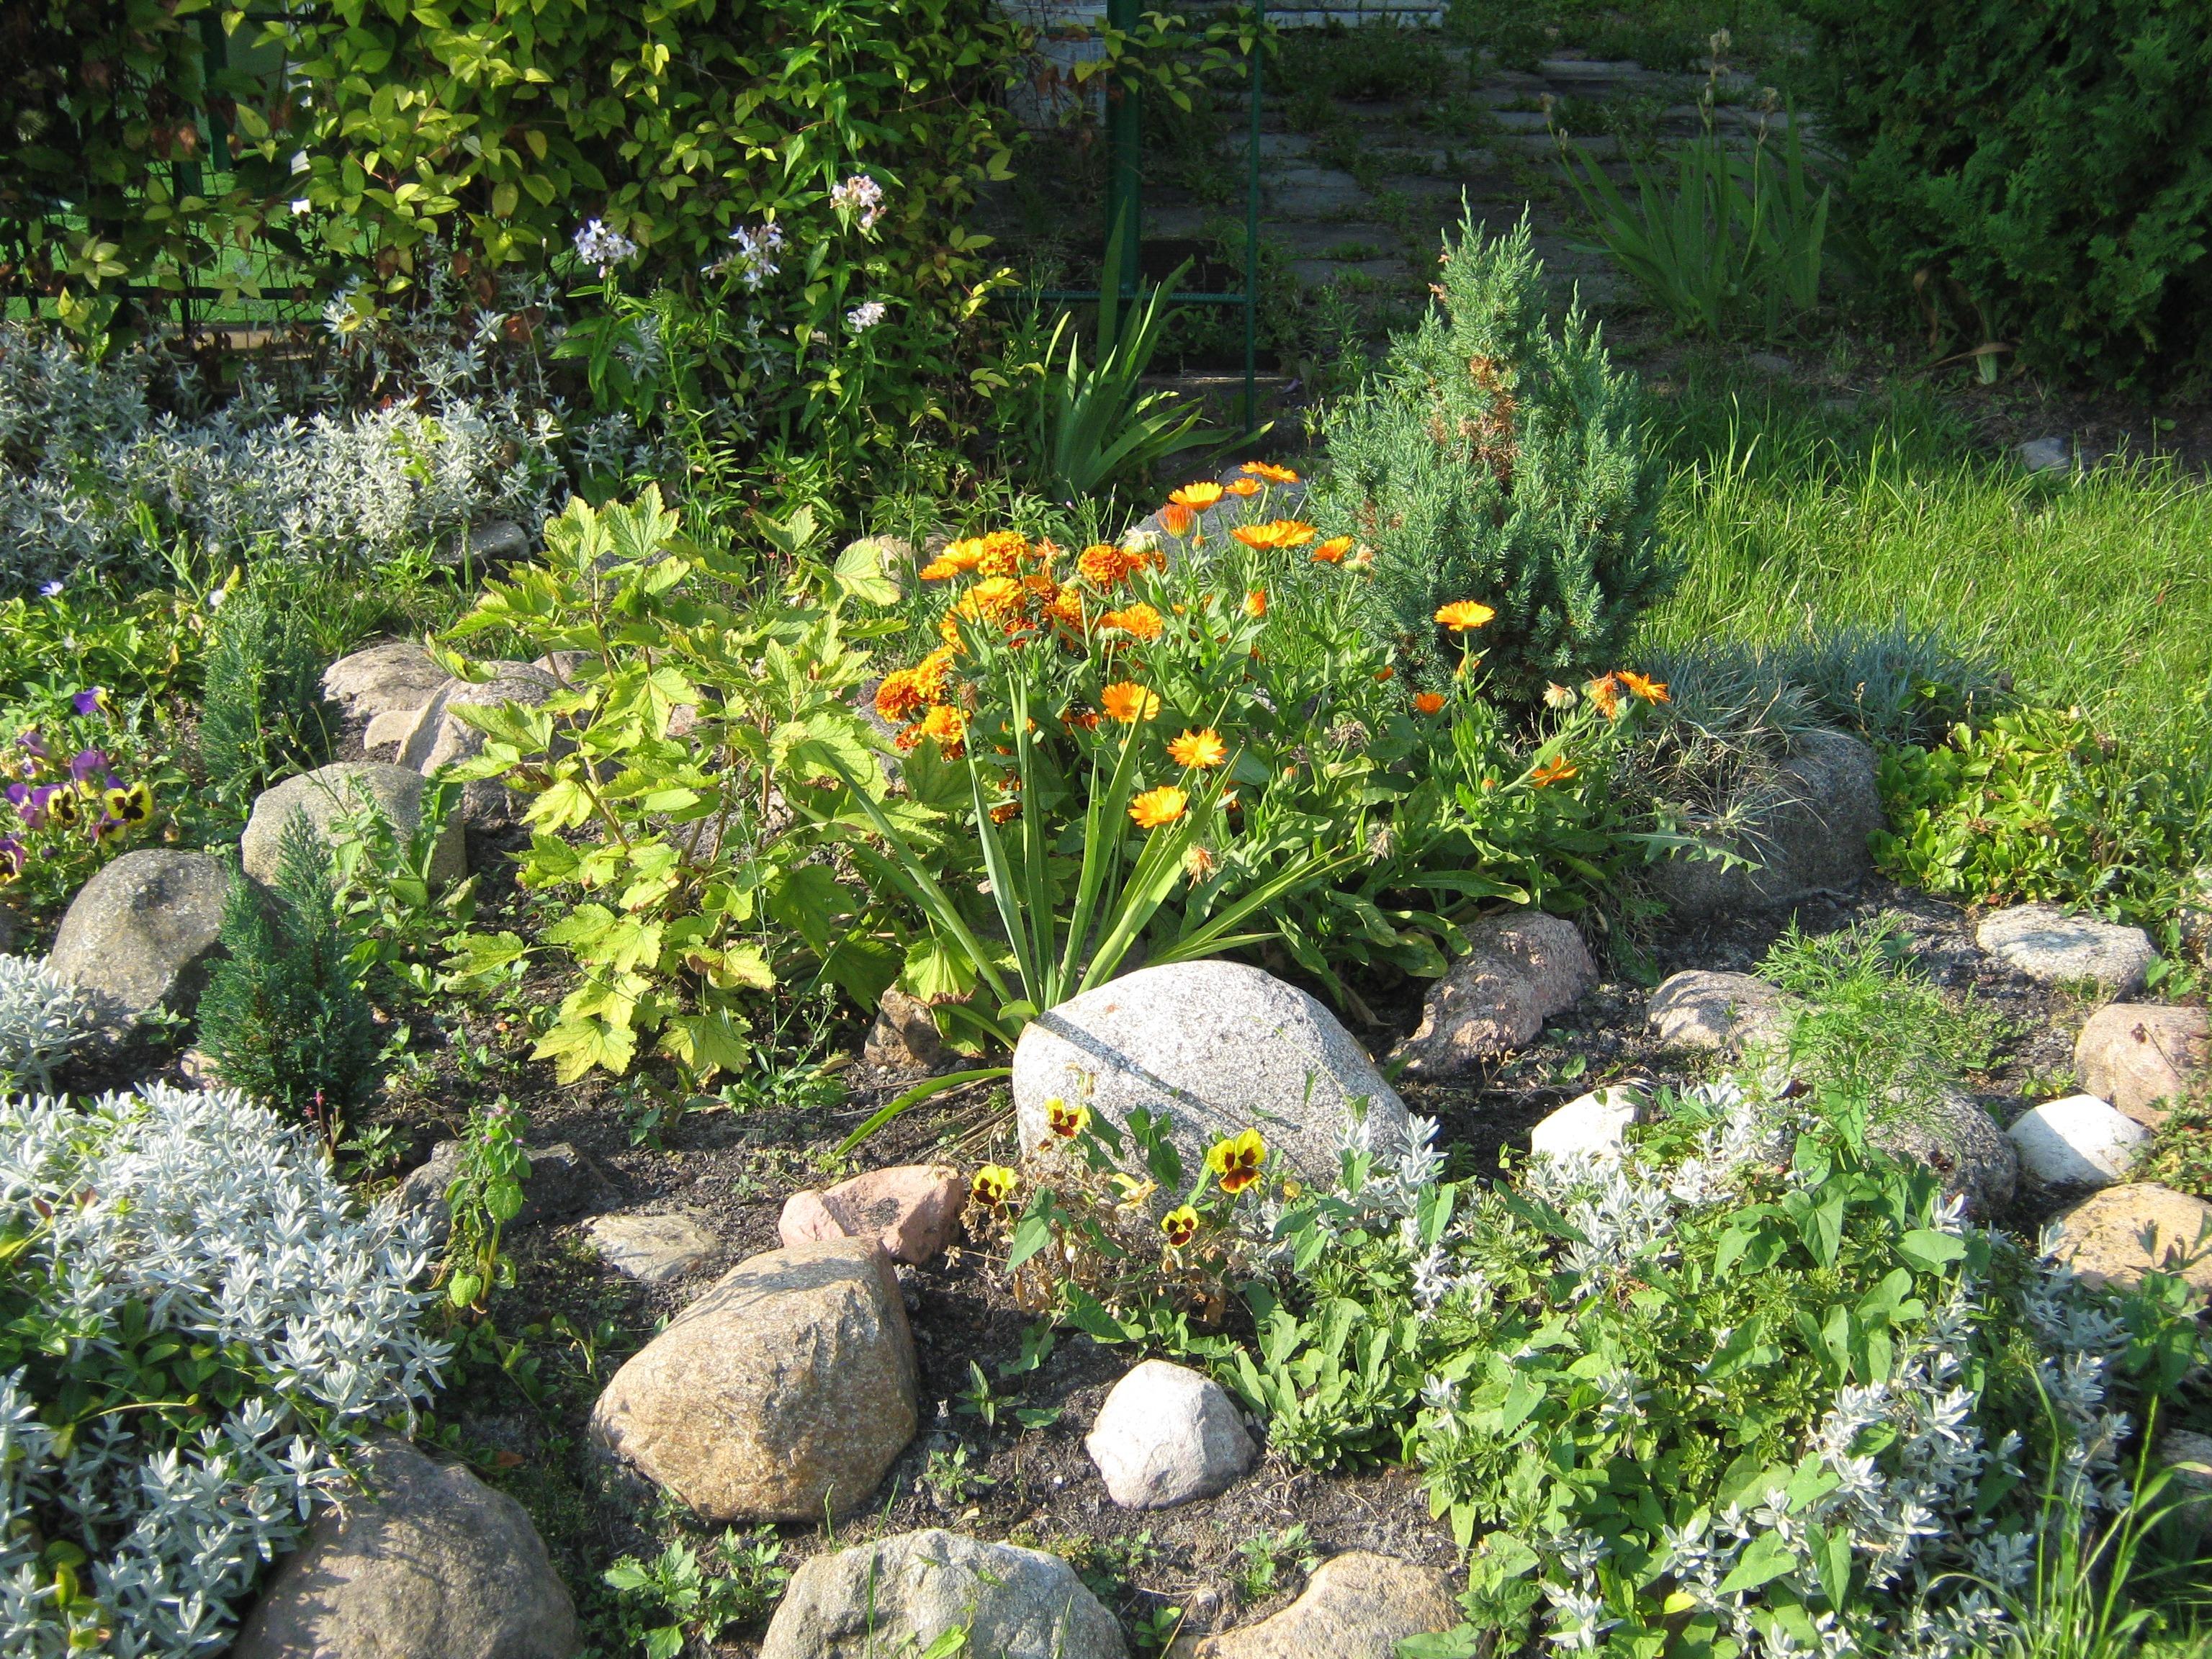 free images lawn flower pond stream backyard botany flora